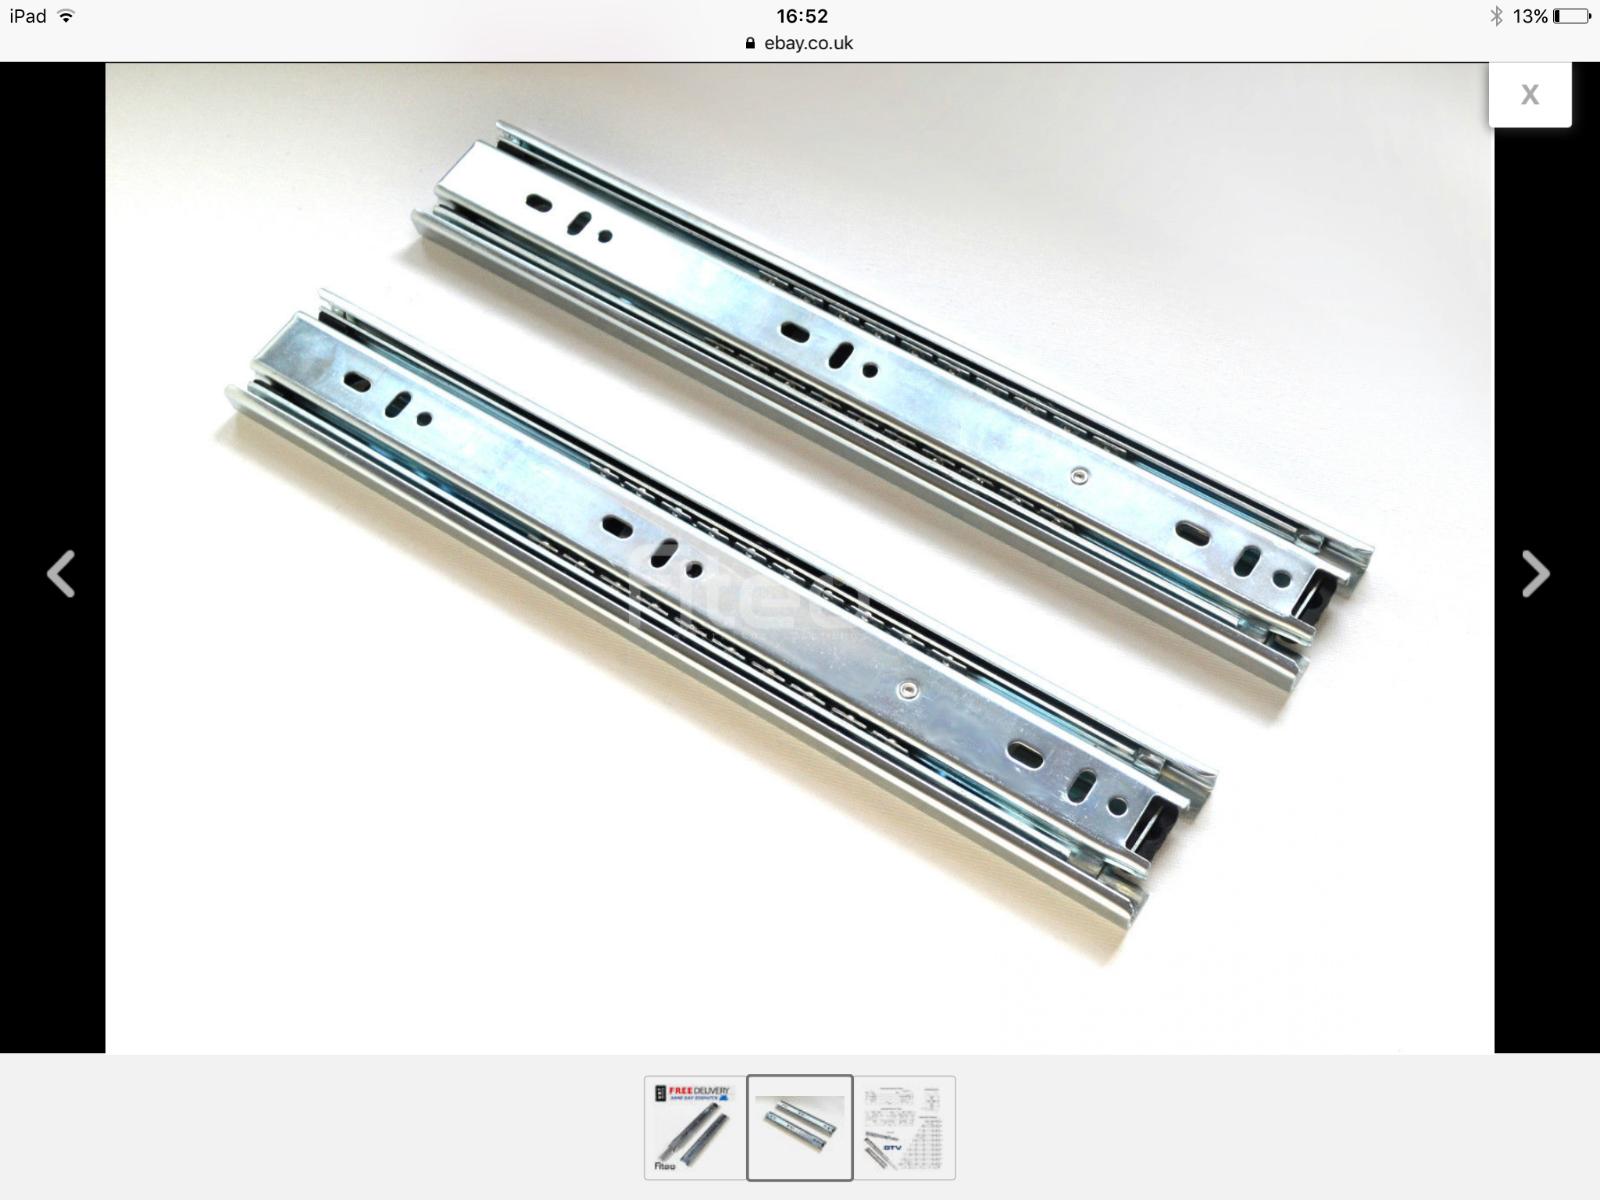 750mm extension drawer slides. BOX OF TEN PAIRS.